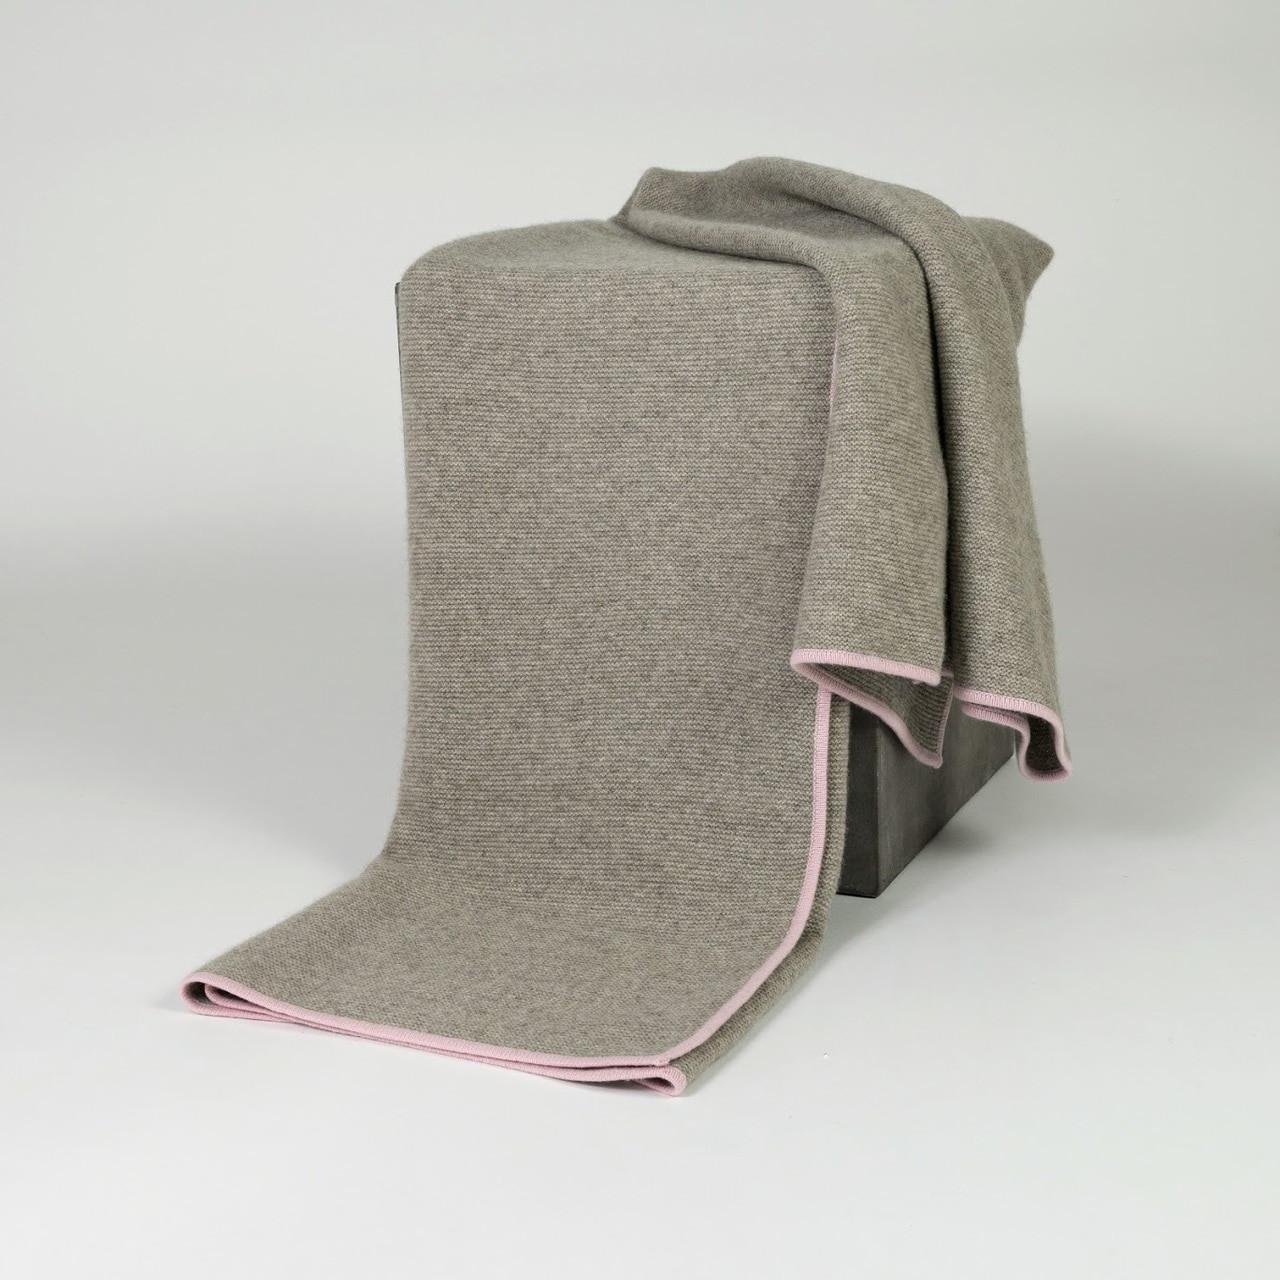 Platinum & Quartz Rose Purl Knit Yak Down Throw